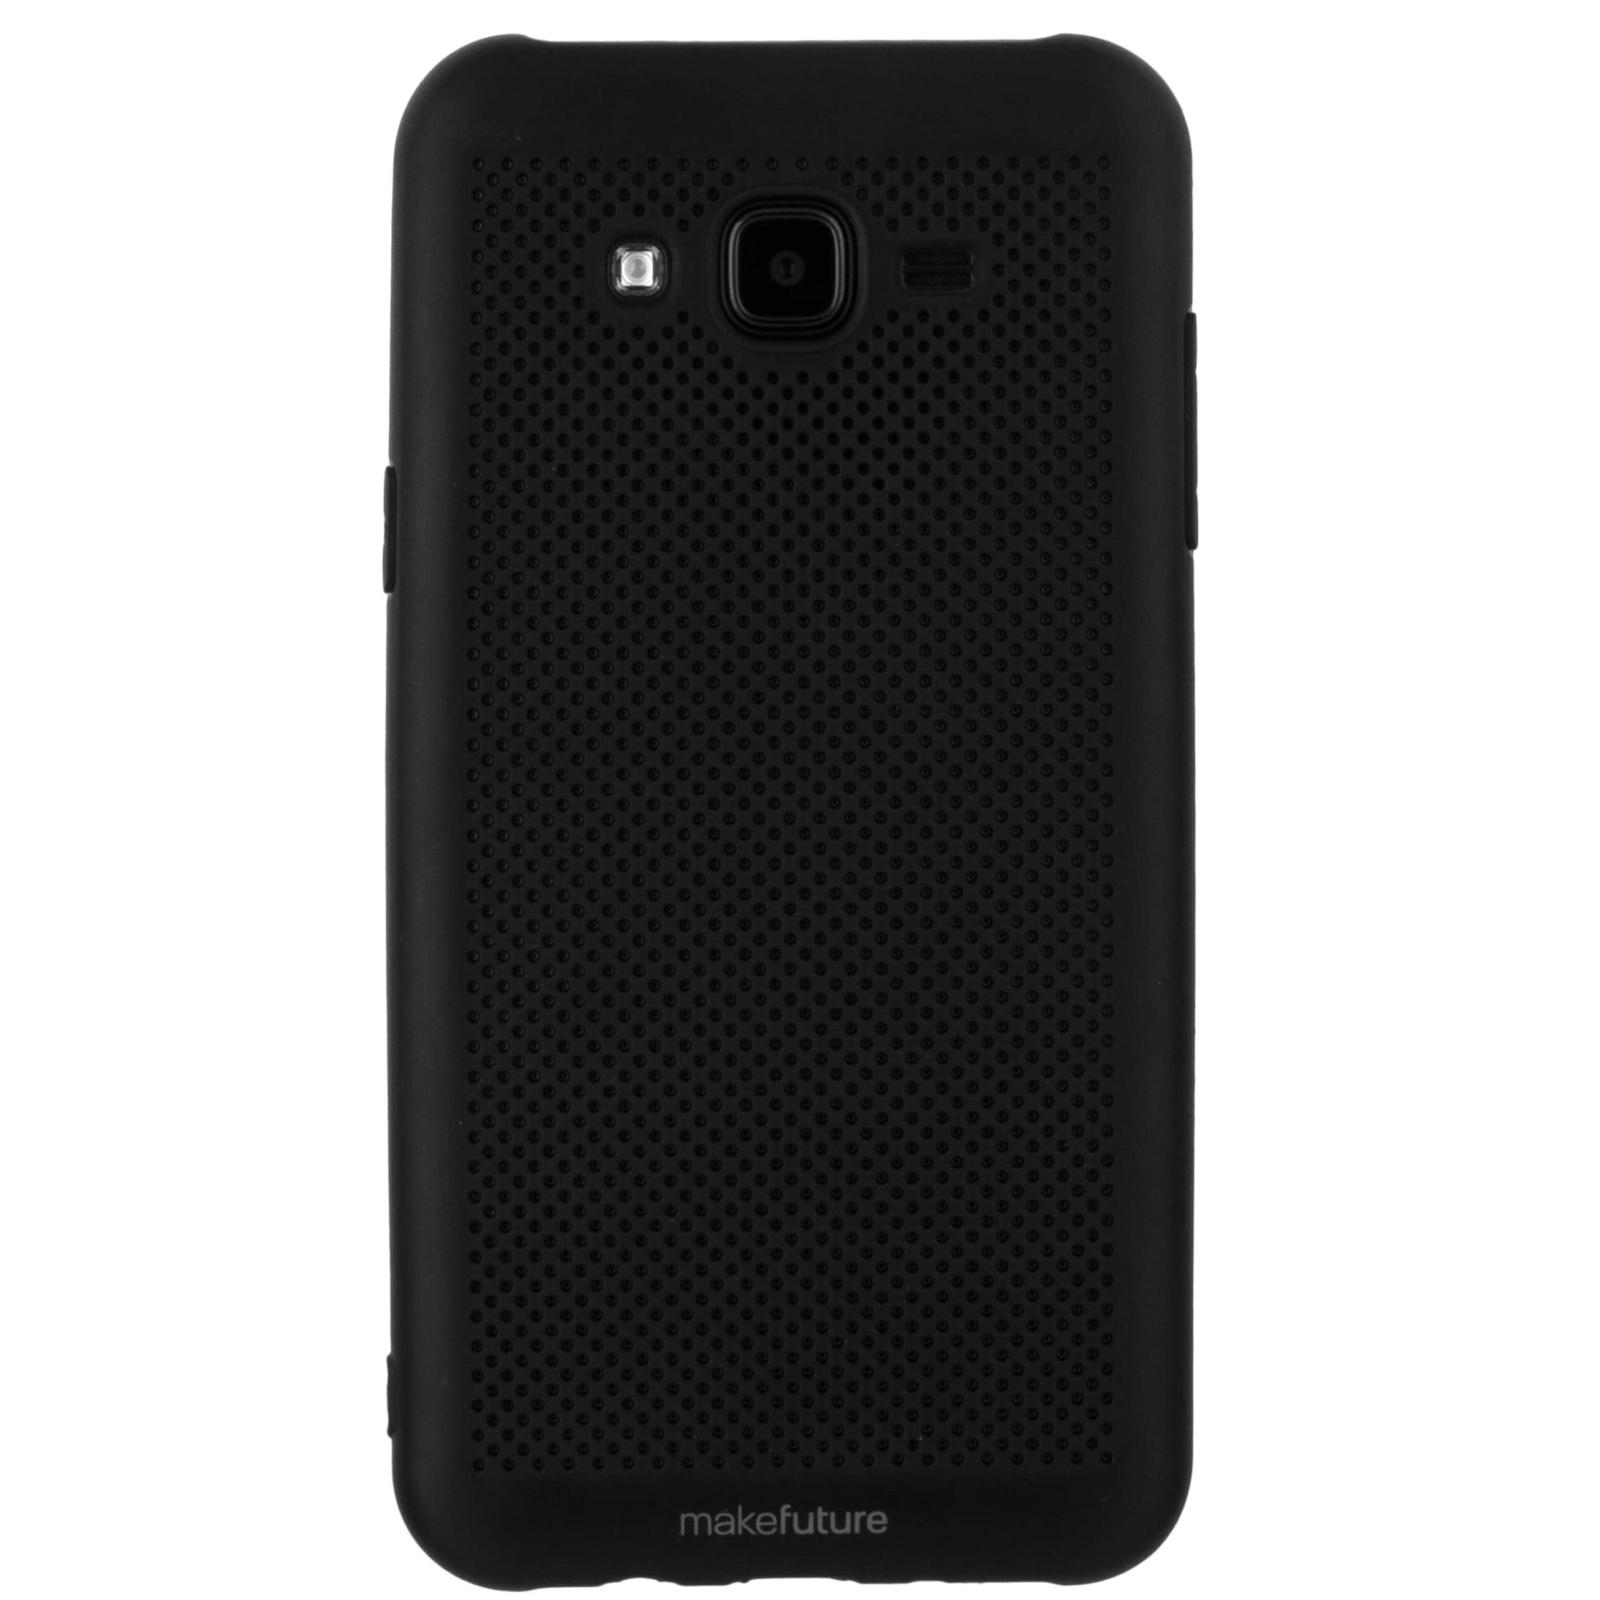 Чехол для моб. телефона MakeFuture Moon Case (TPU) для Samsung J7 Neo (J701) Black (MCM-SJ7NBK)